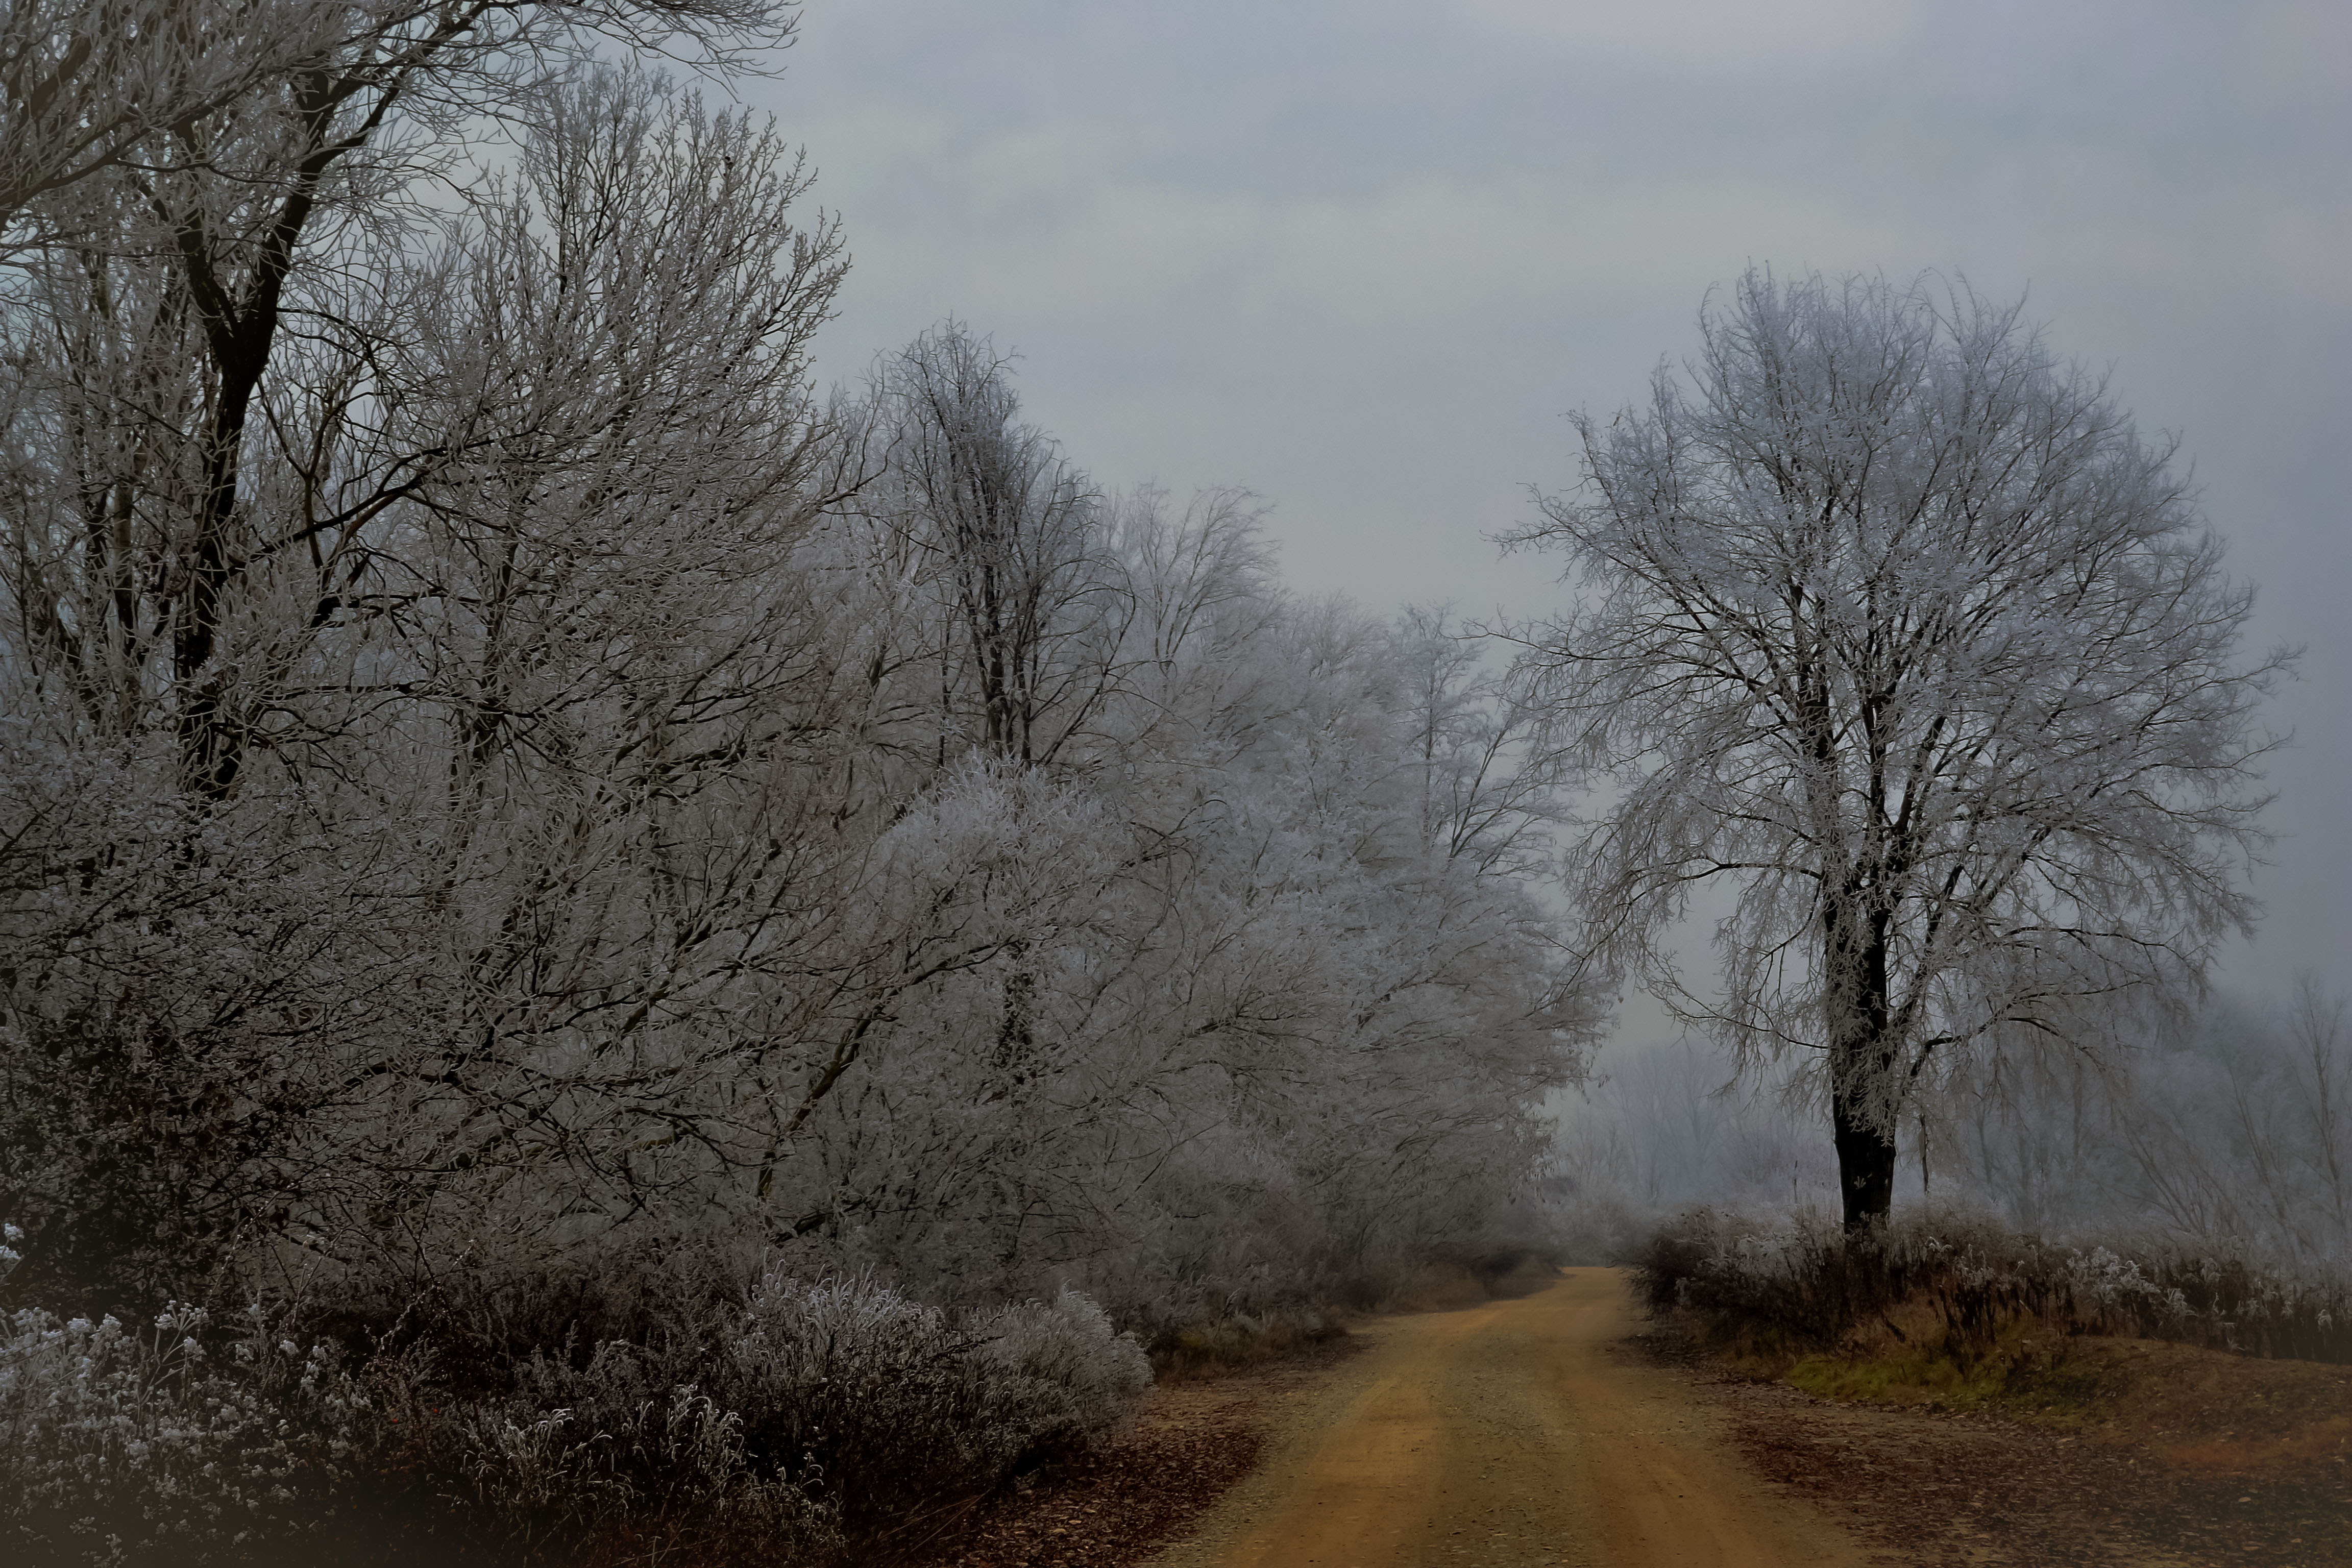 Un freddo inverno di vaiolet